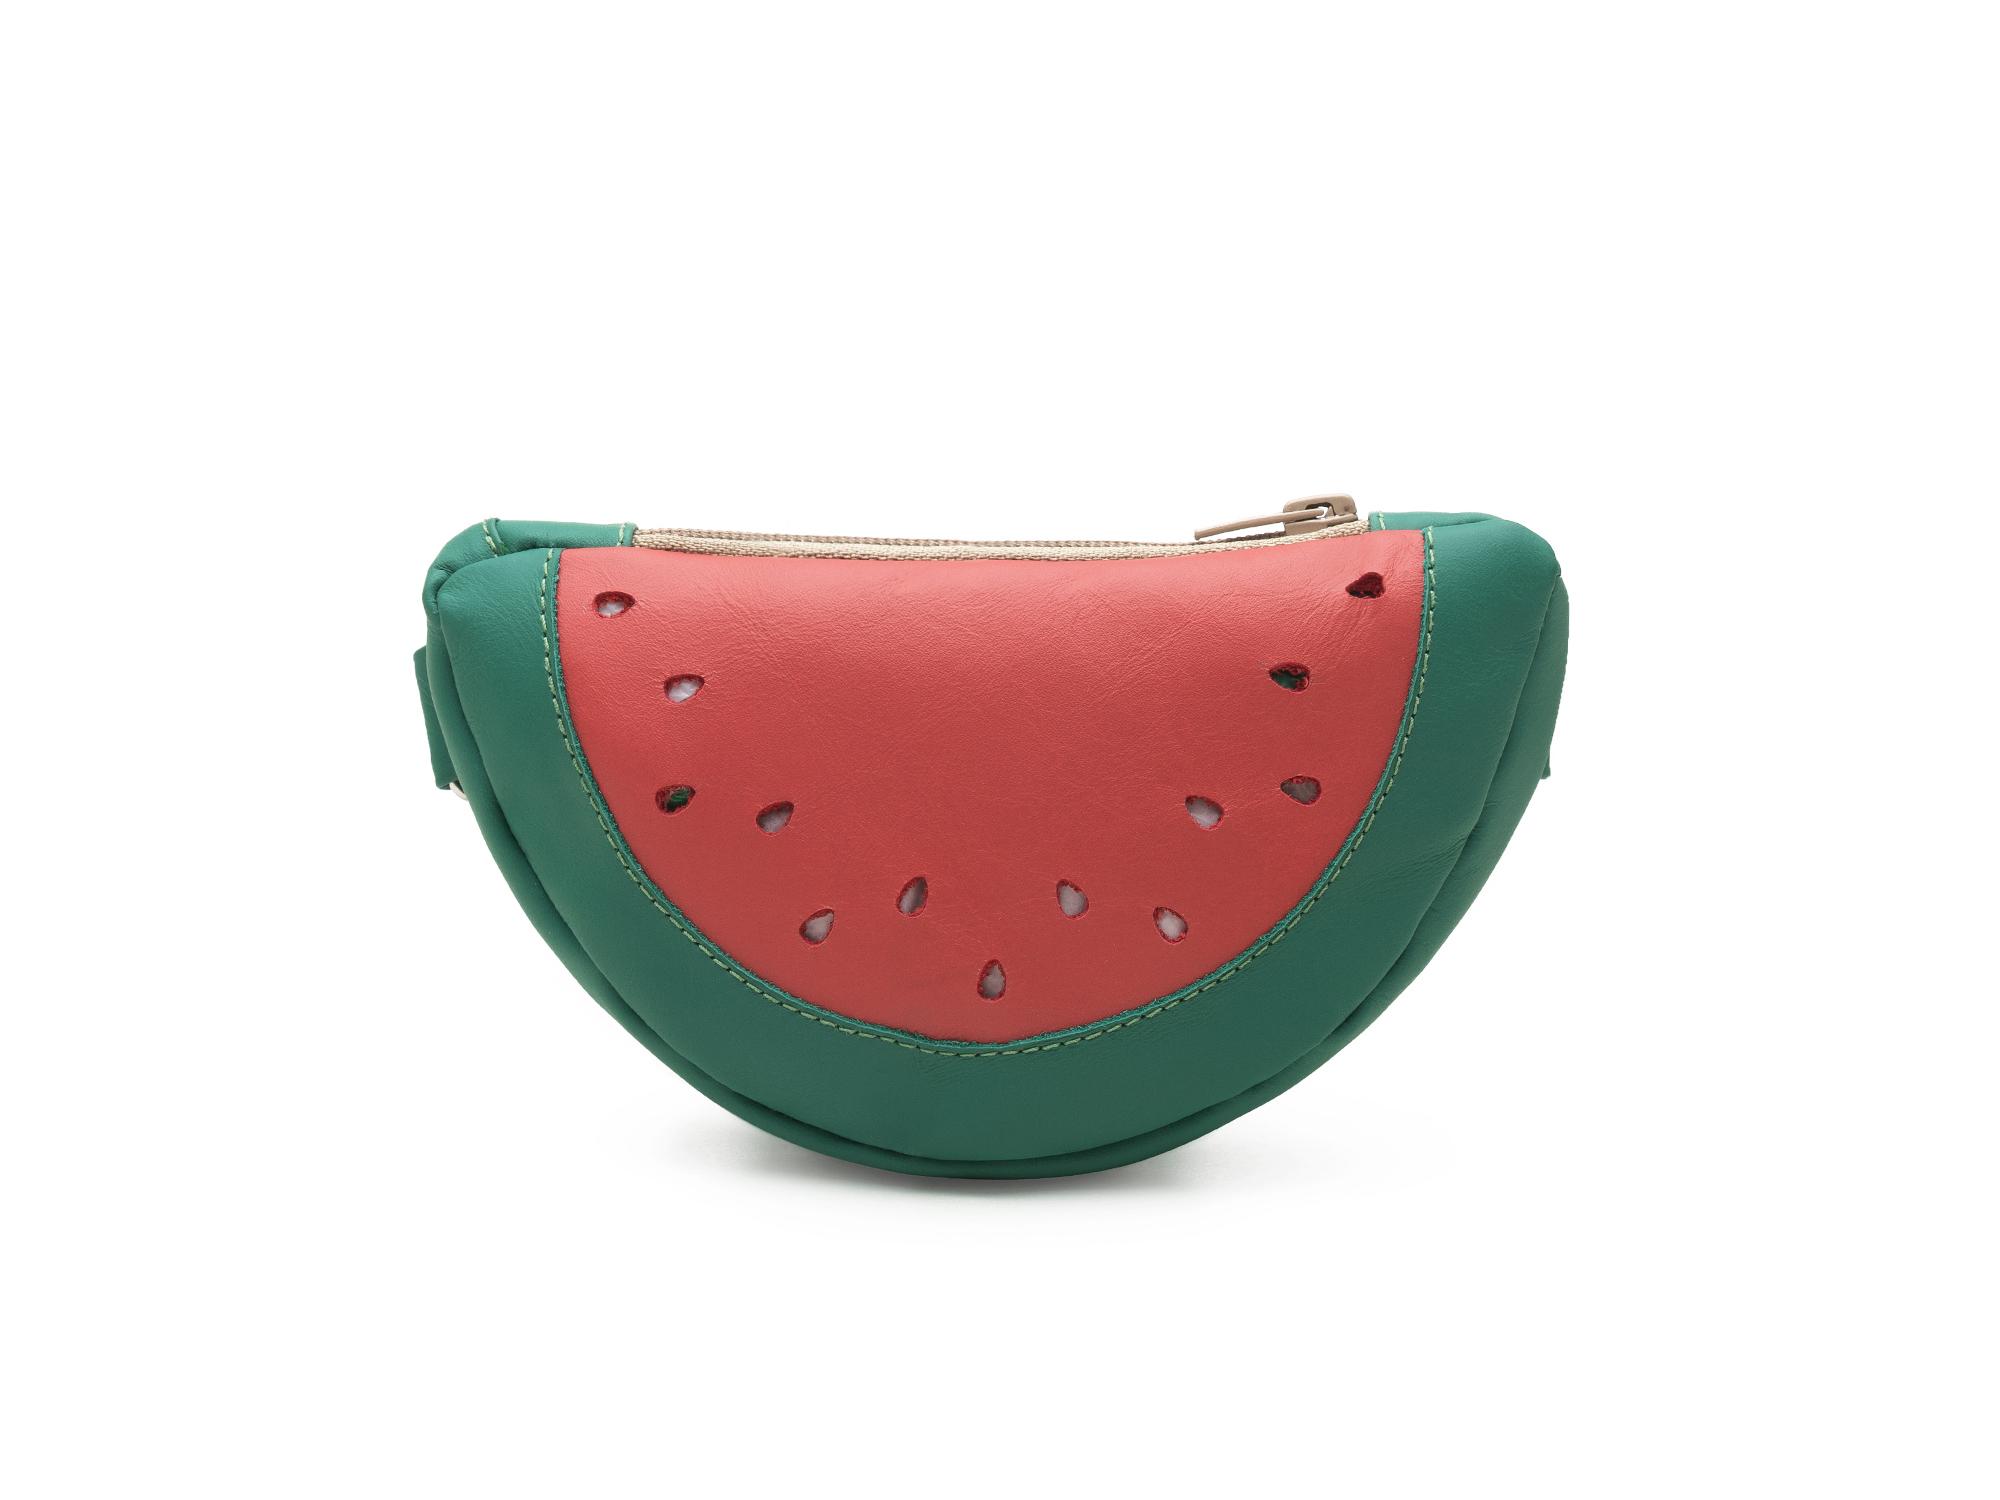 Bolsa  unisex1 bag fruity